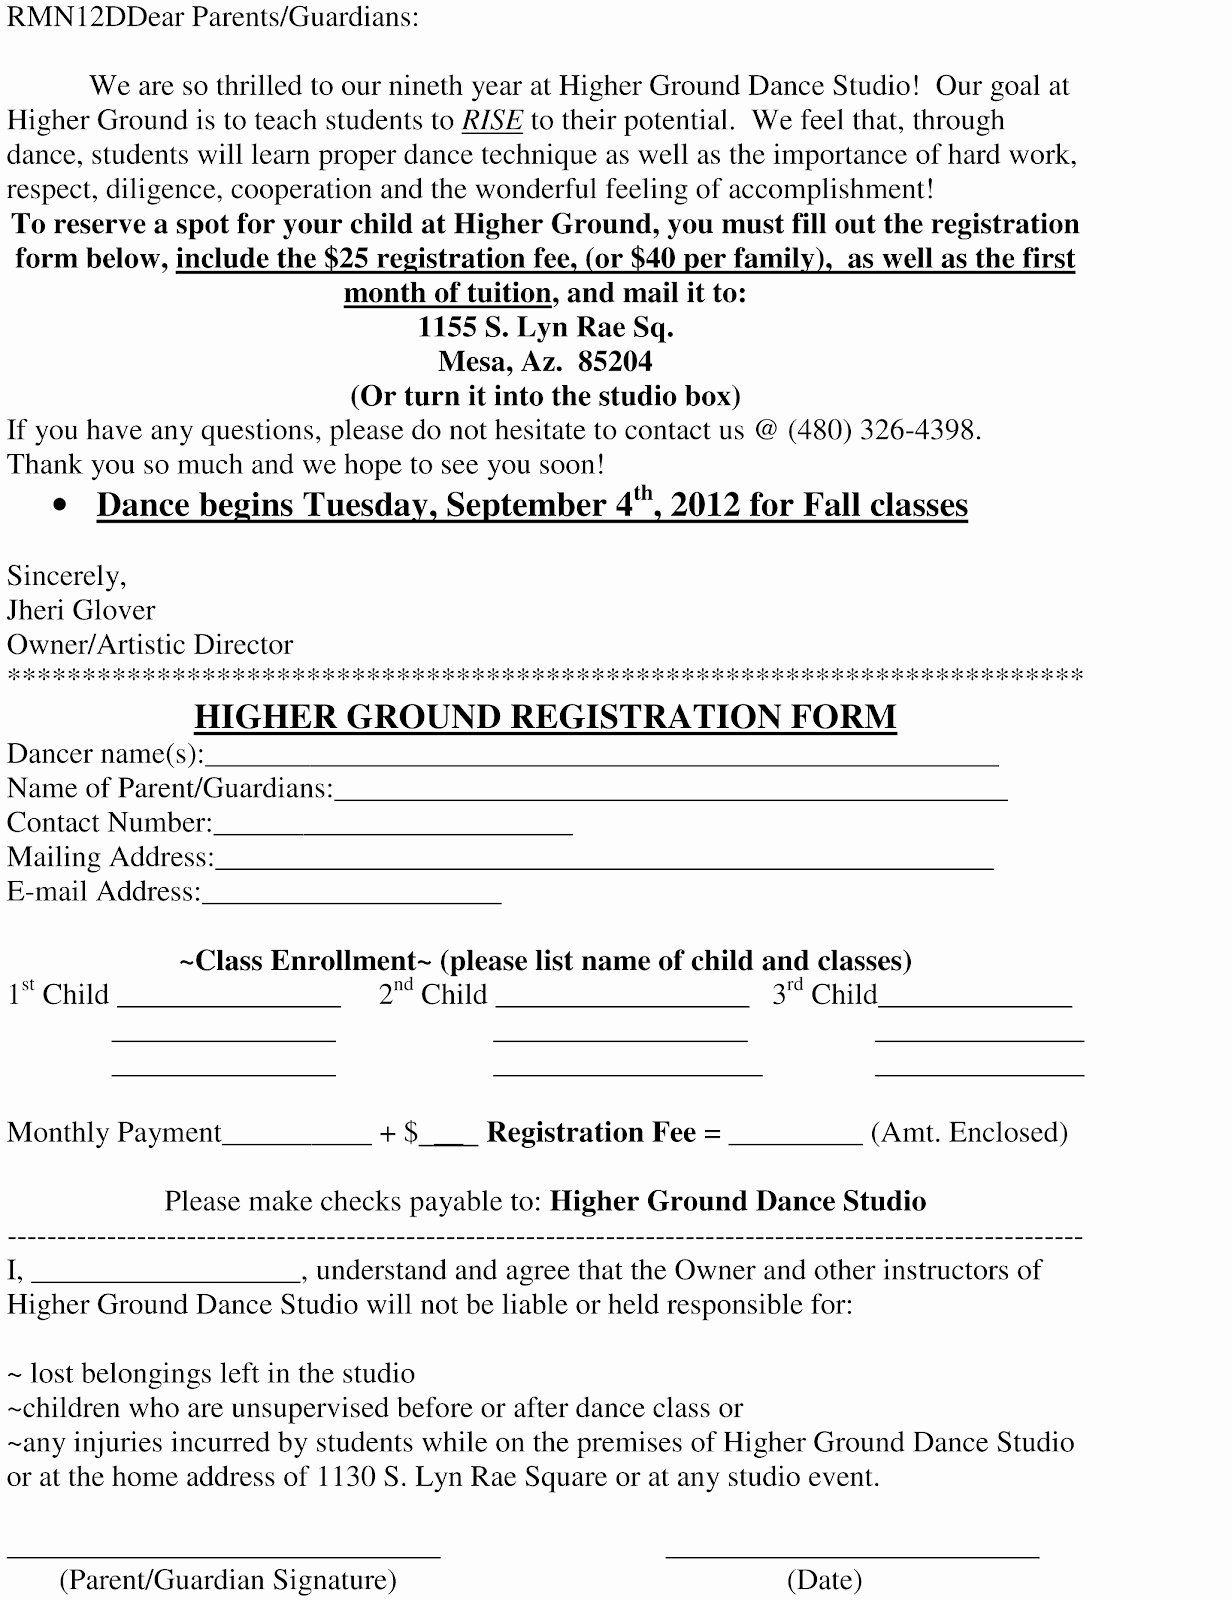 Dance Registration form Template Beautiful Higher Ground Dance Studio Registration form and Dance